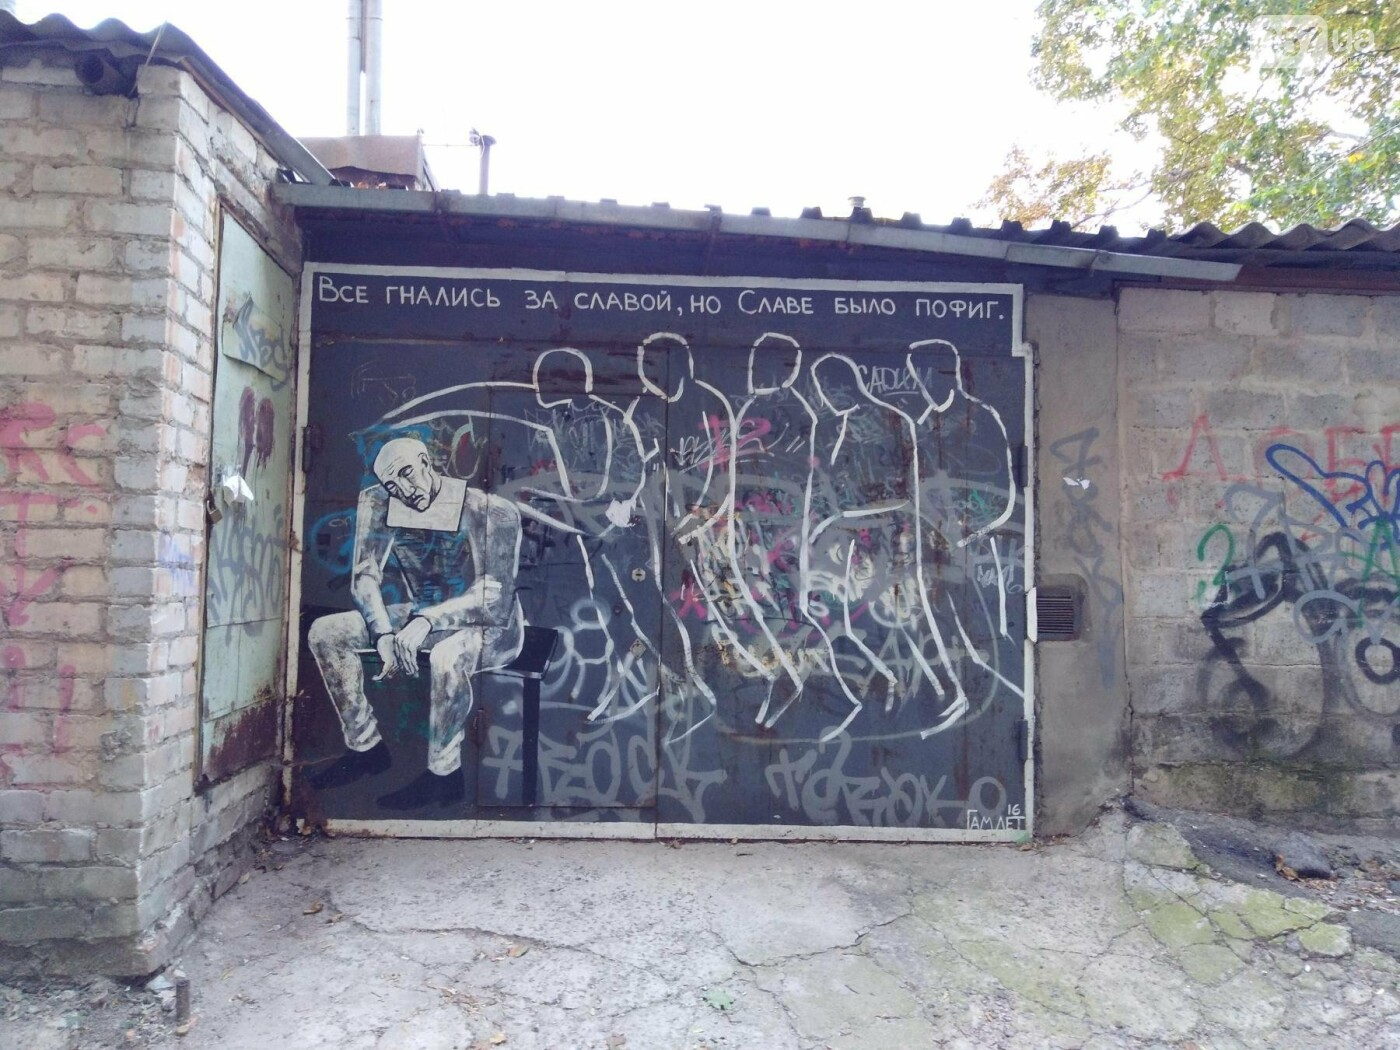 Стрит-арт Гамлета в Харькове: ТОП-10 граффити художника, - ФОТО, фото-23